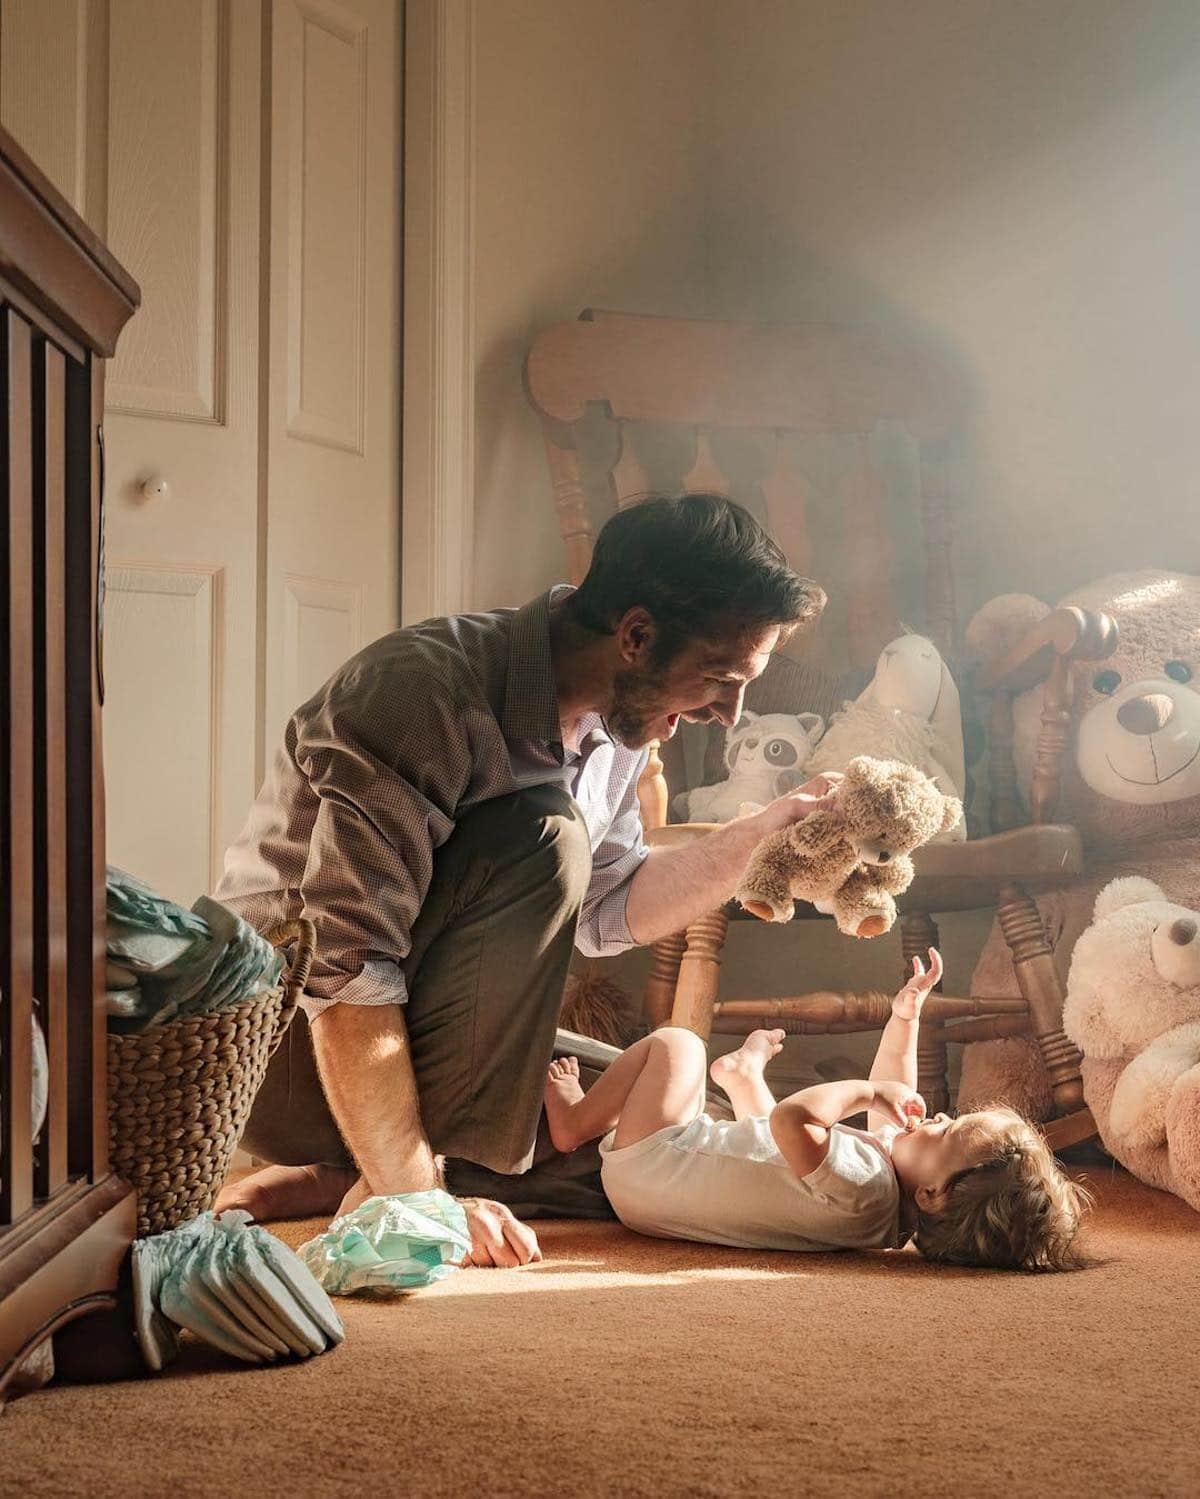 Creative Family Photo by Adrian C. Murray